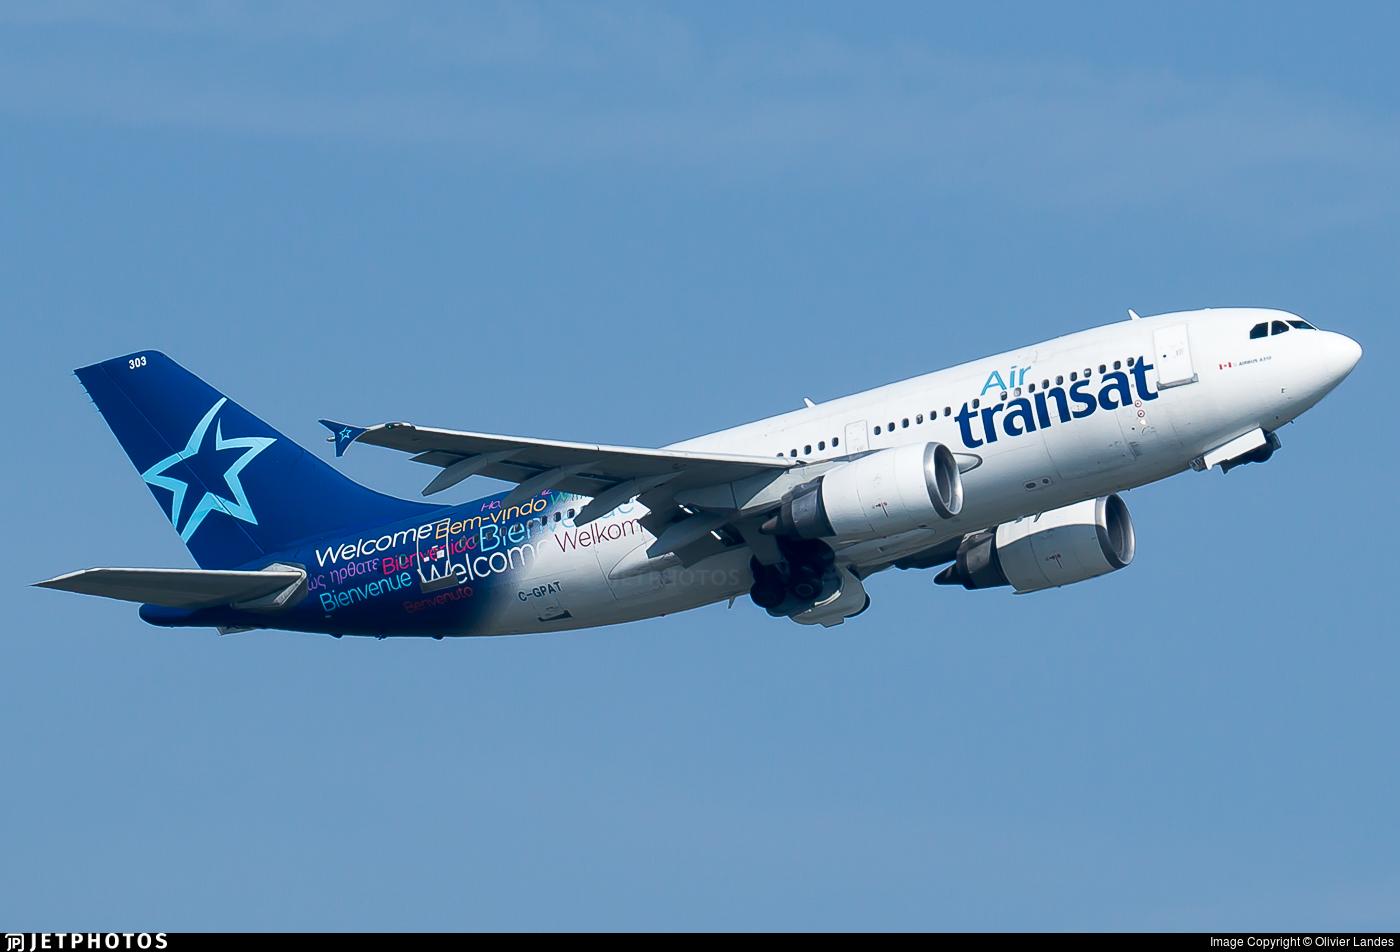 C-GPAT - Airbus A310-308 - Air Transat